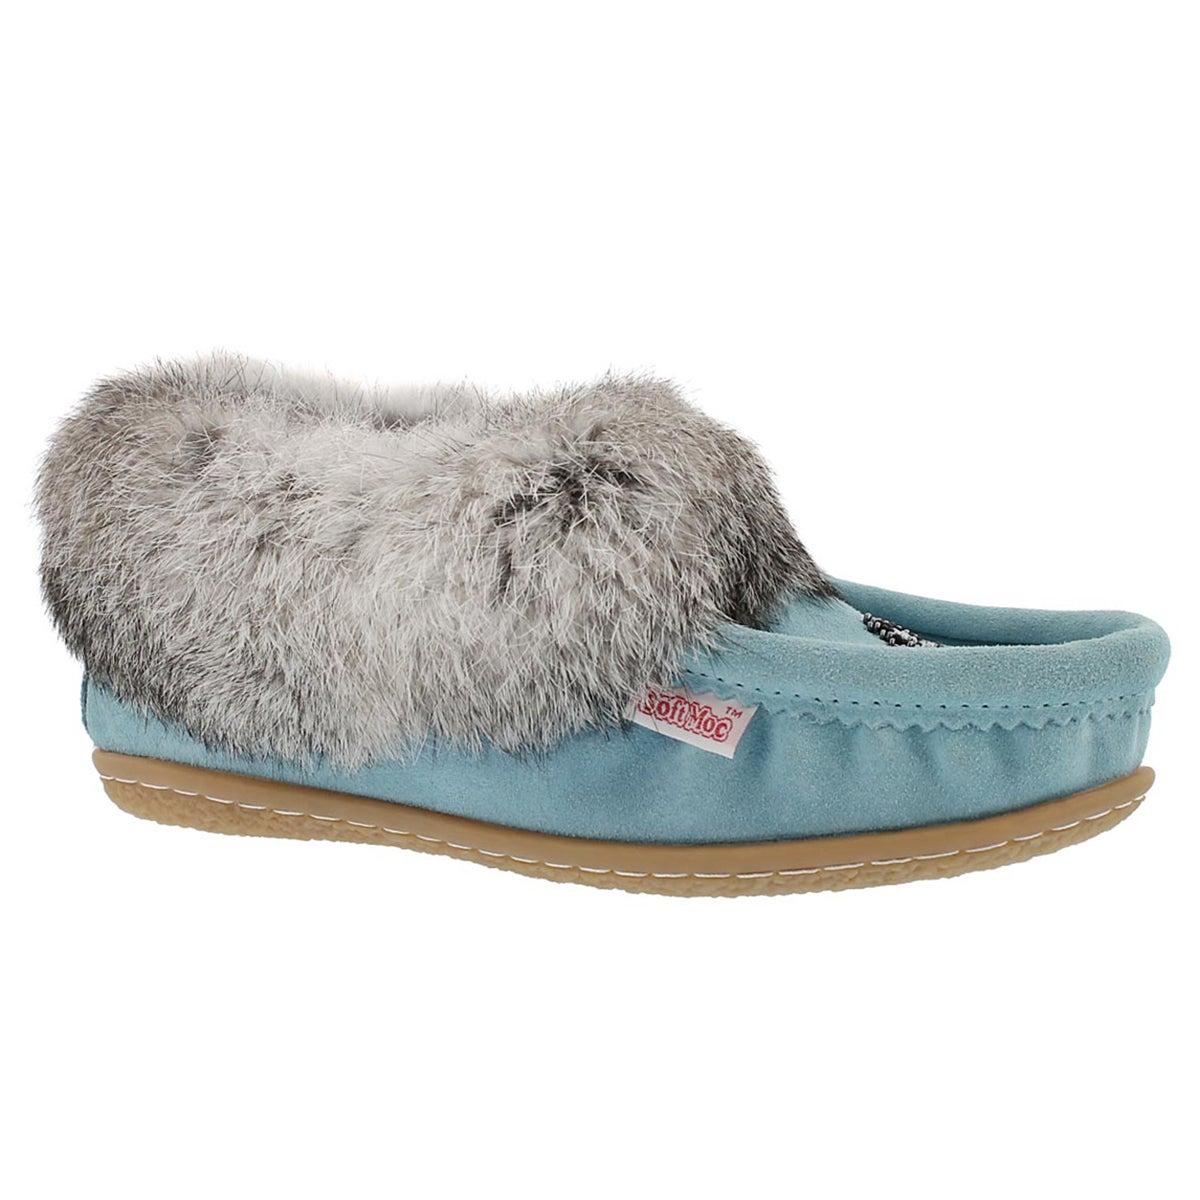 Women's CUTE 4 light blue rabbit fur moccasin